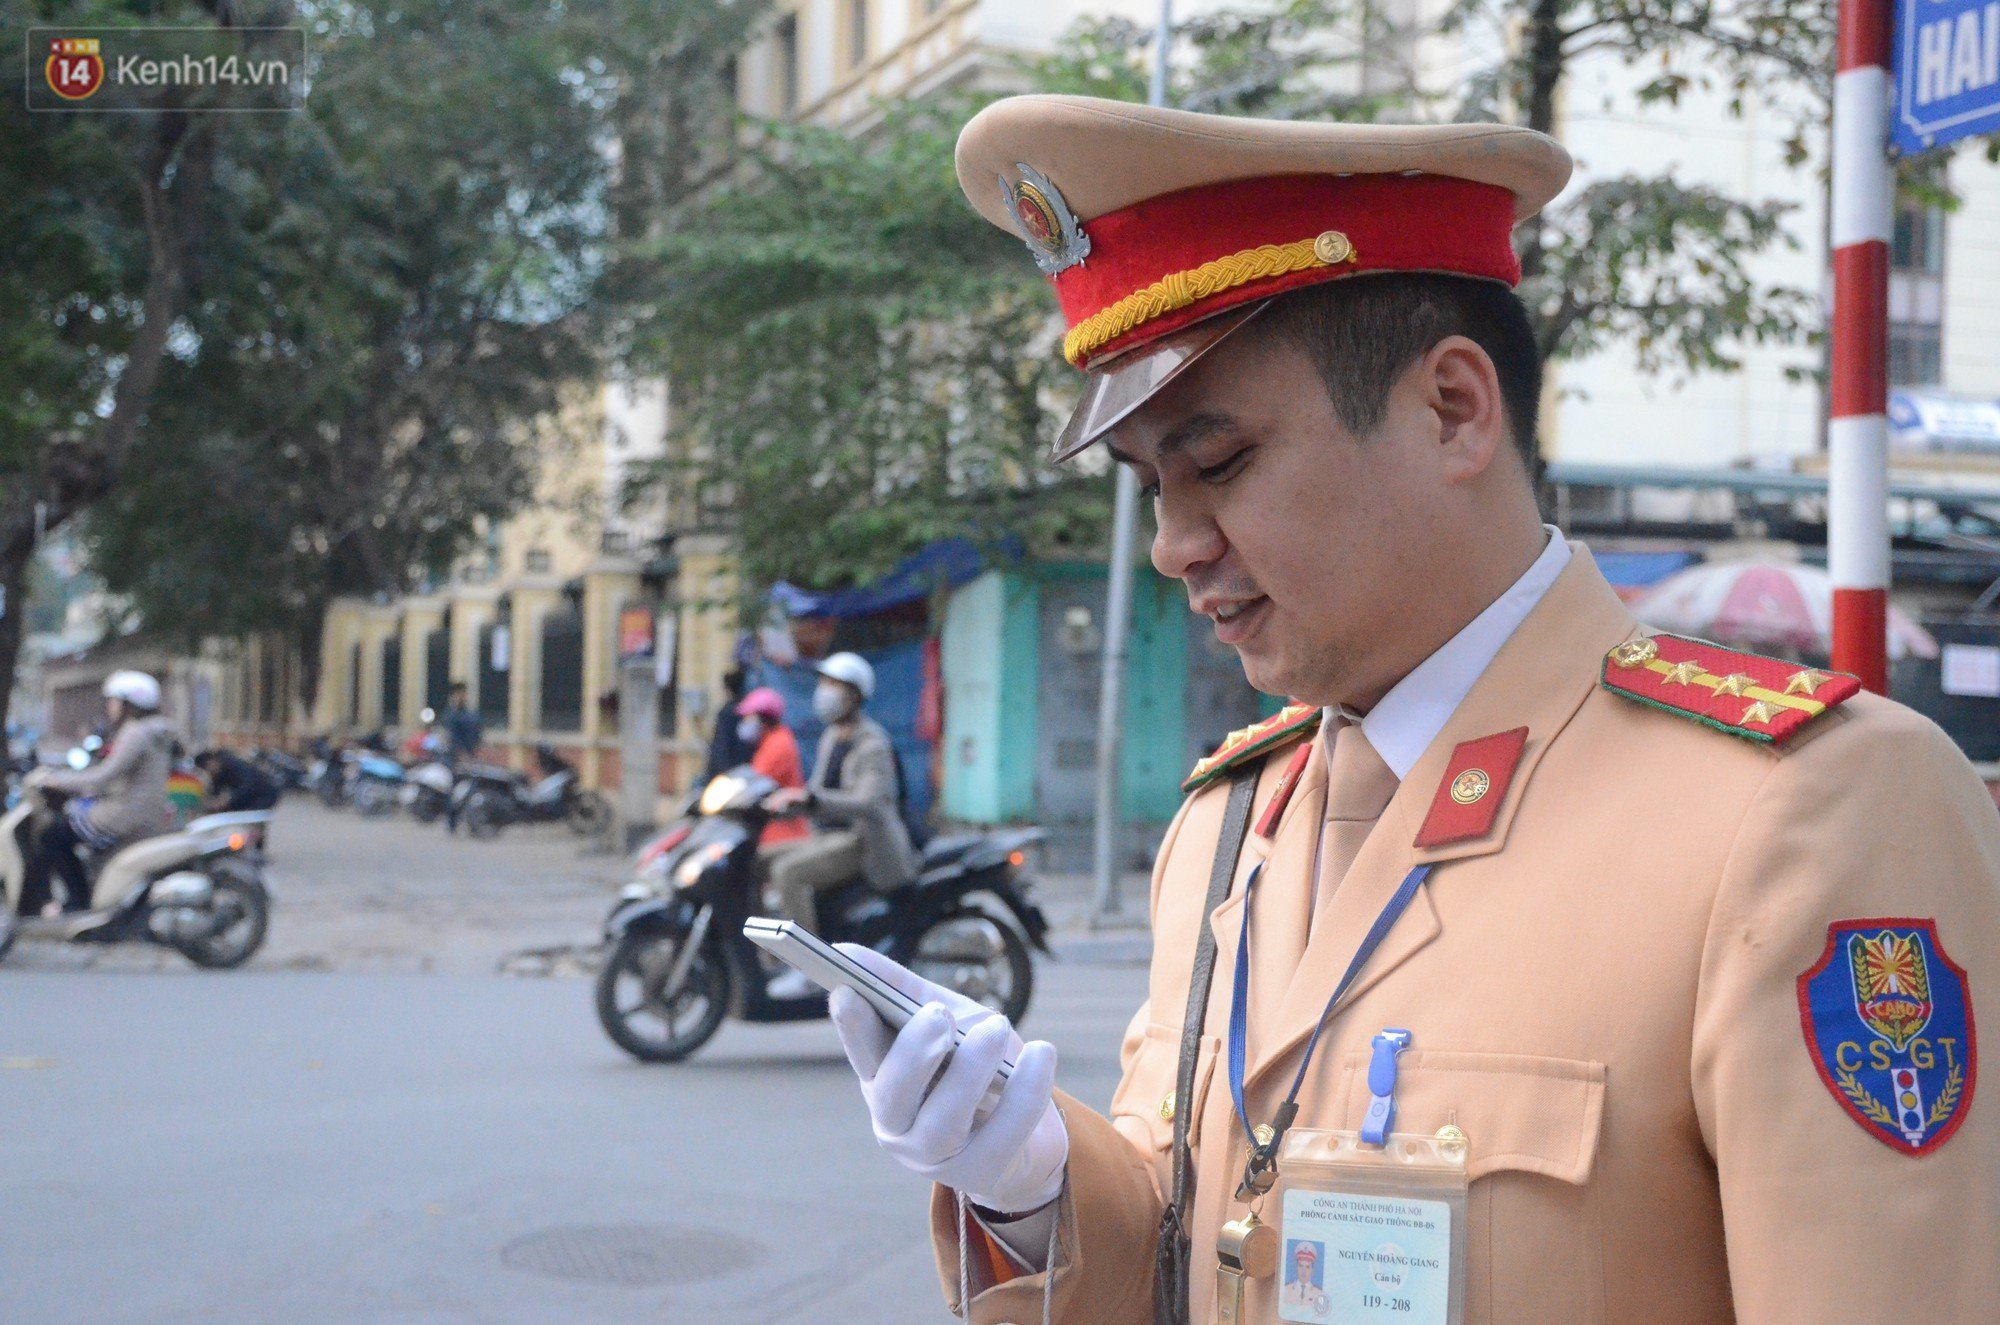 Gap chien si CSGT vua phan luong vua dap tay moi nguoi mung chien thang U23 Viet Nam hinh anh 2